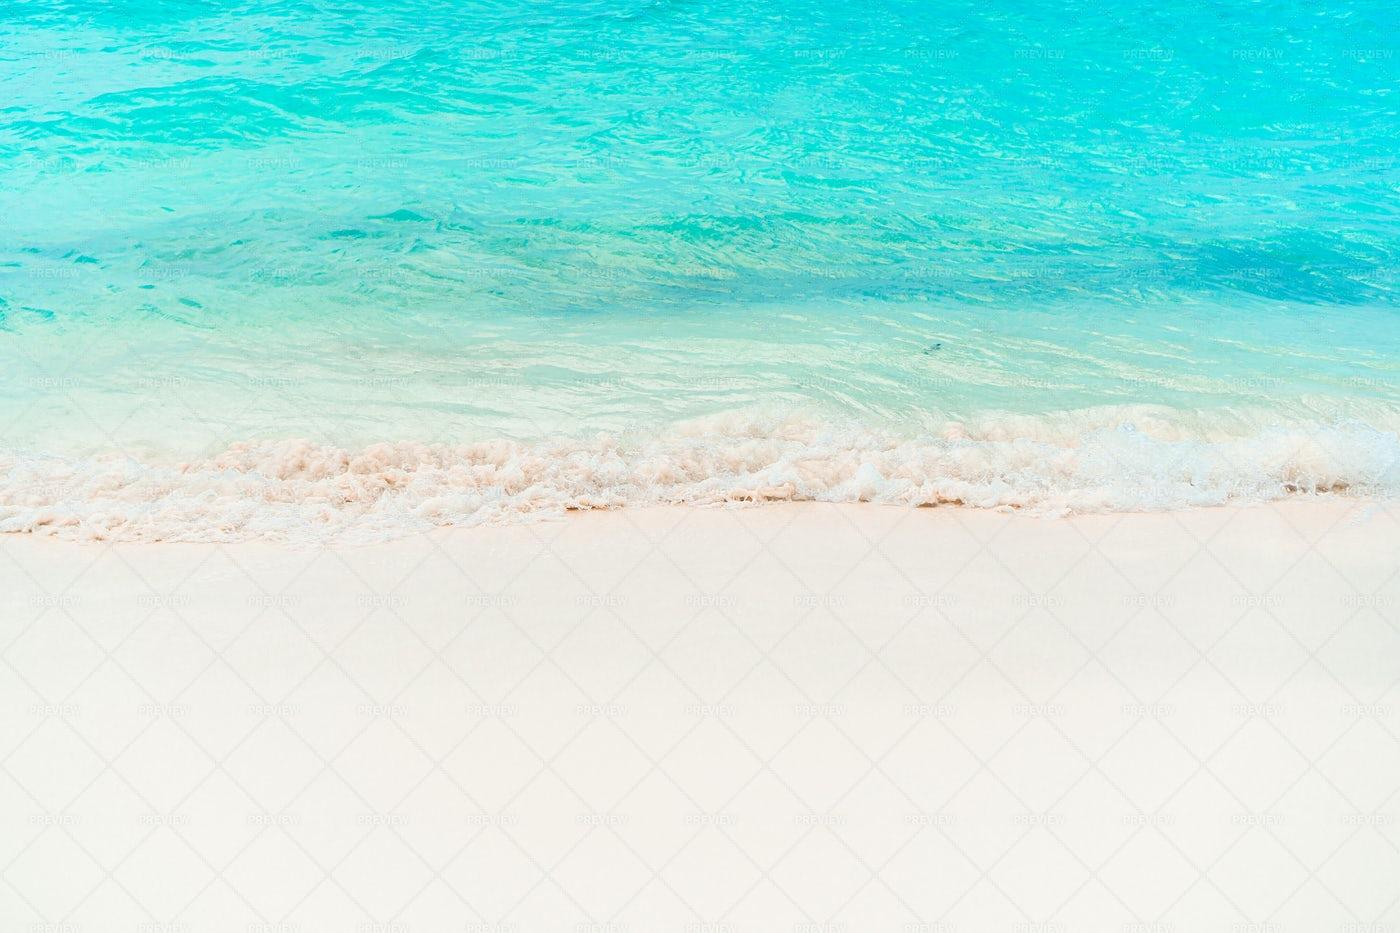 Tropical Beach With White Sand: Stock Photos